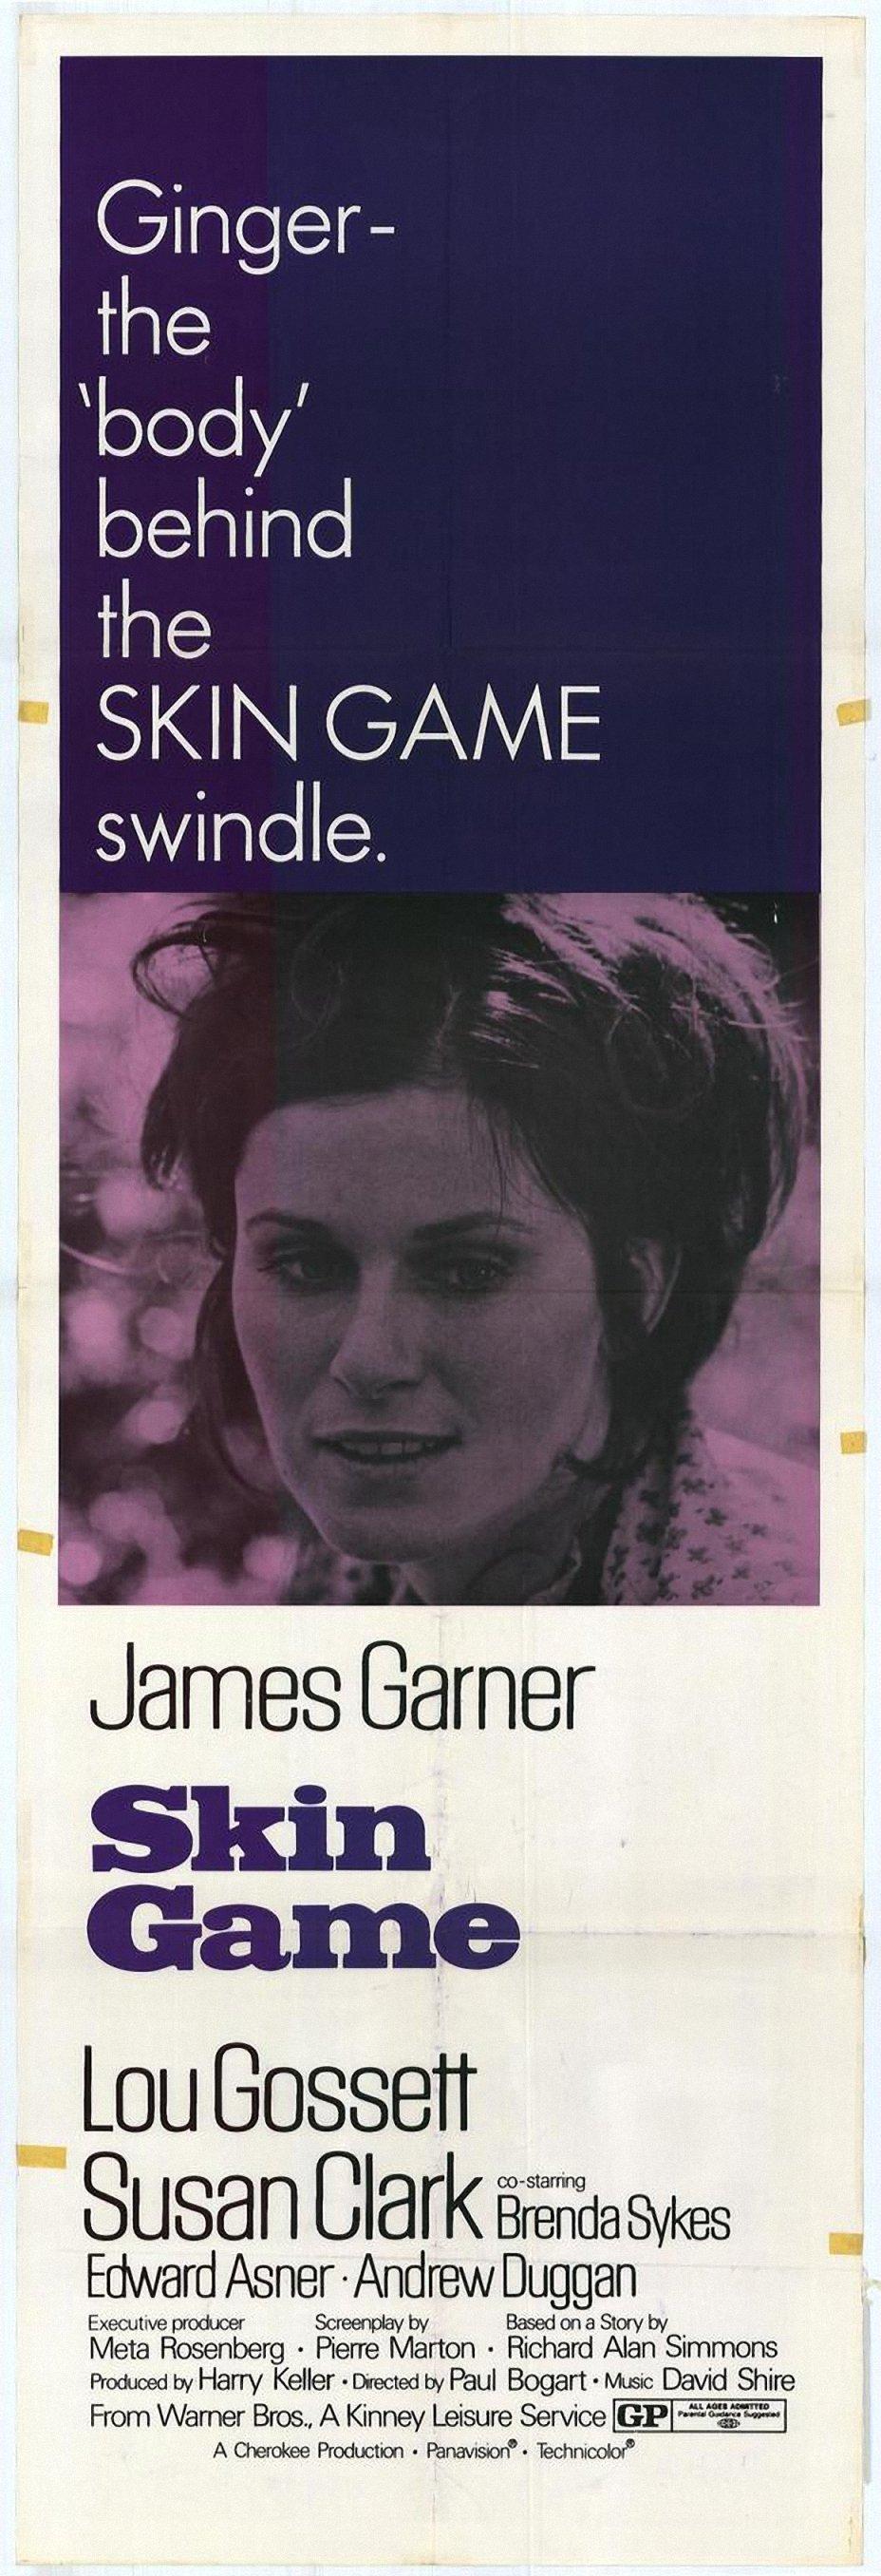 James Garner Archives - Great Western Movies